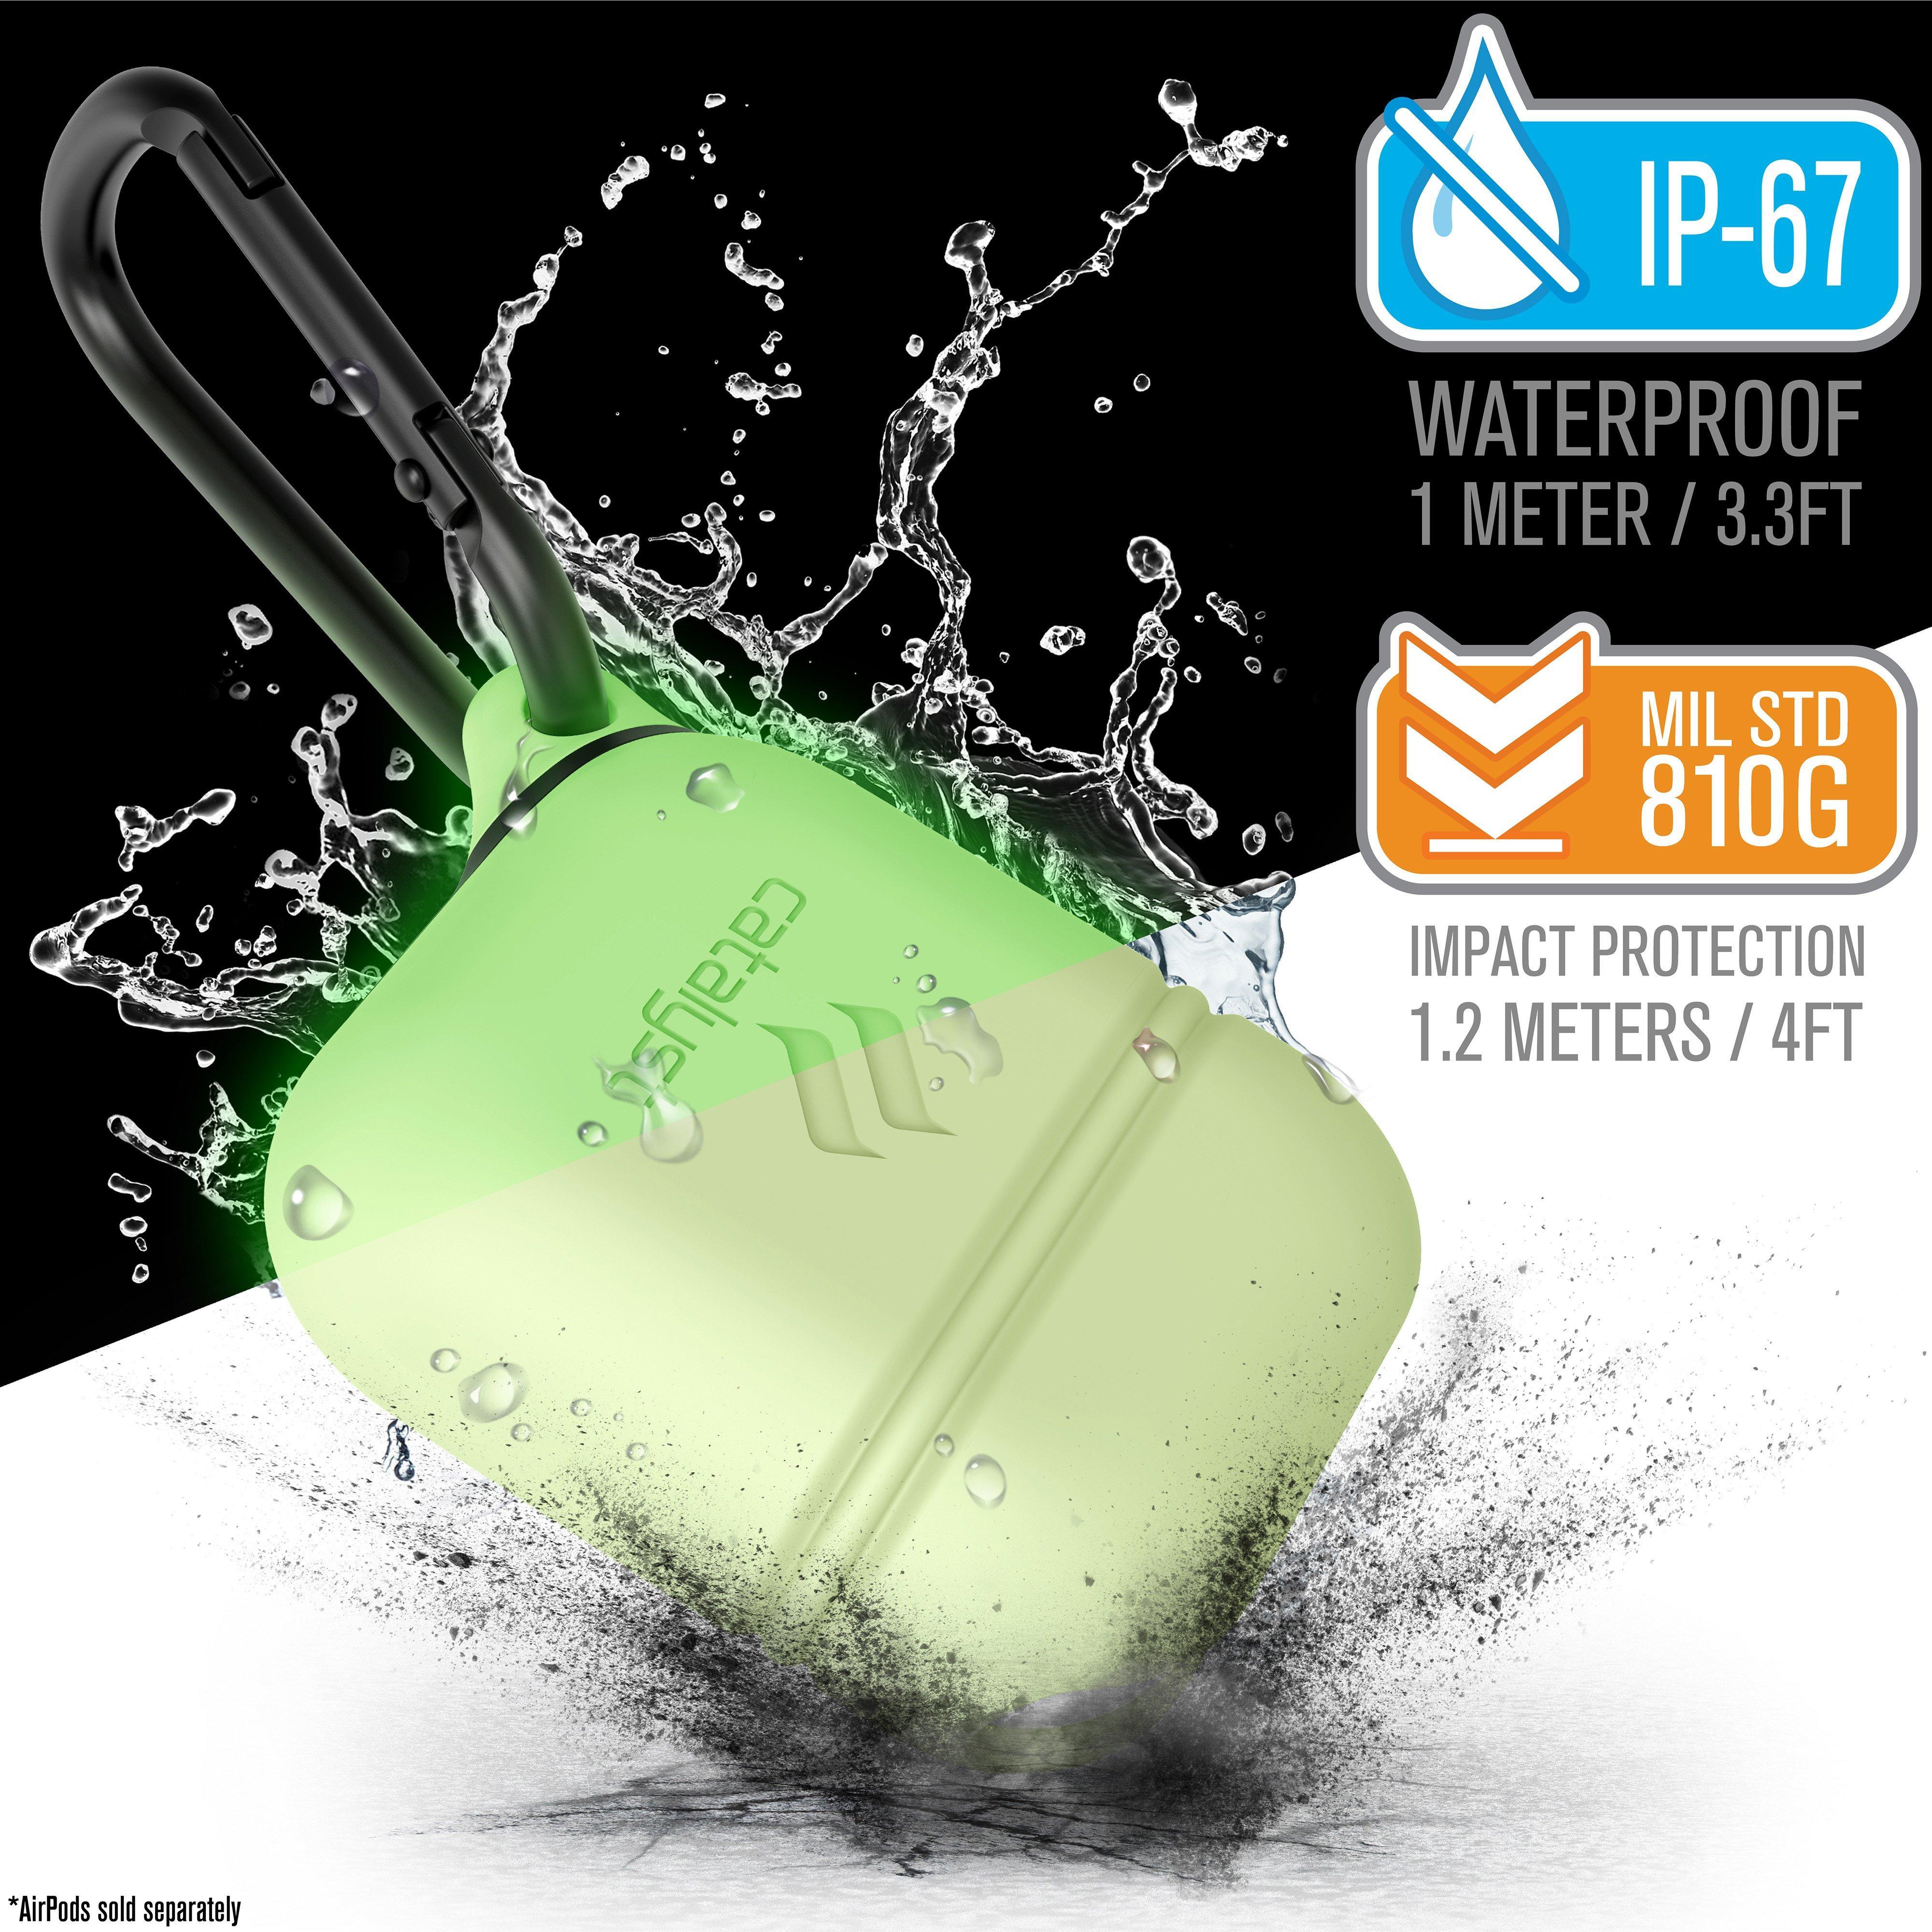 Catalyst Waterproof Apple AirPods Case - Glow in the Dark